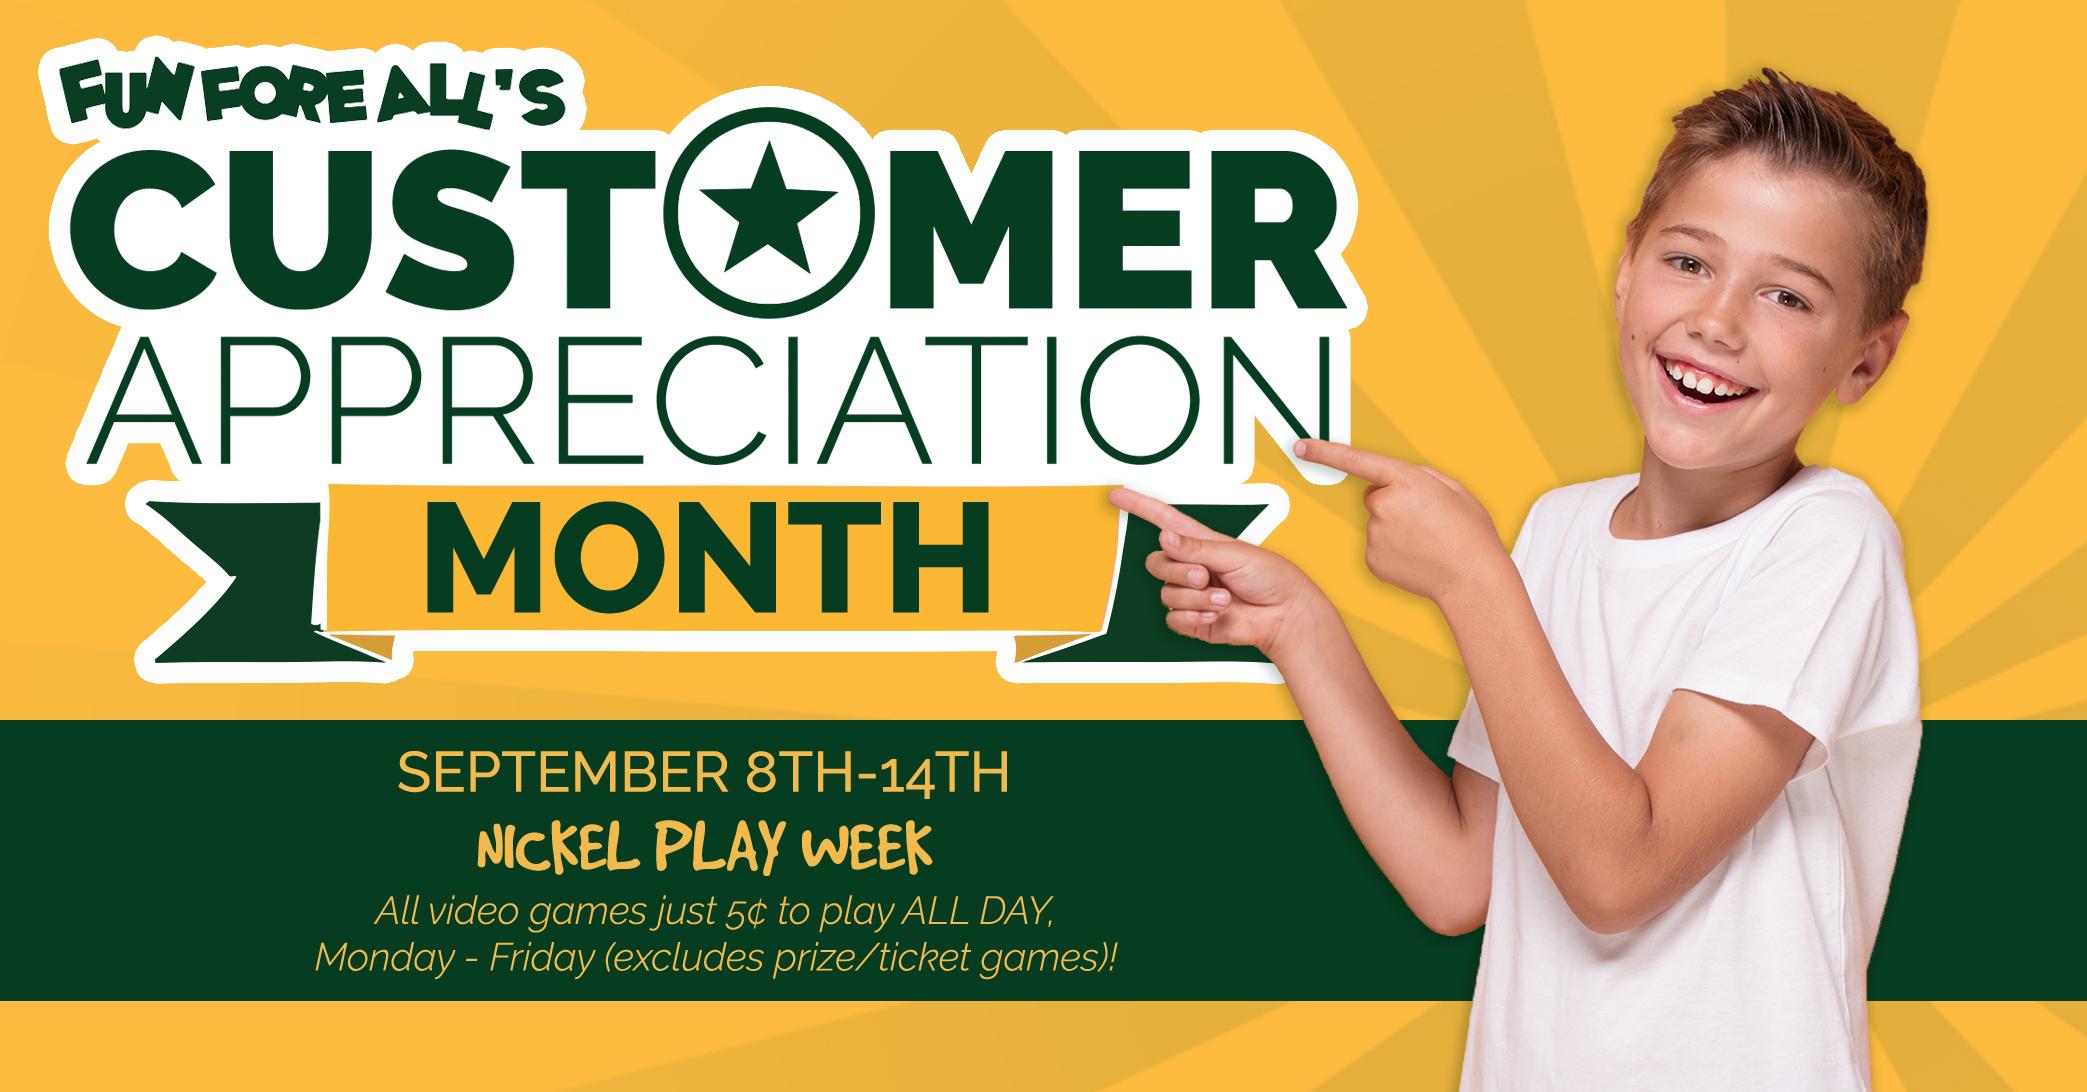 Facebook Invite (Customer Appreciation Month) Nickel Play Week 2019.jpg